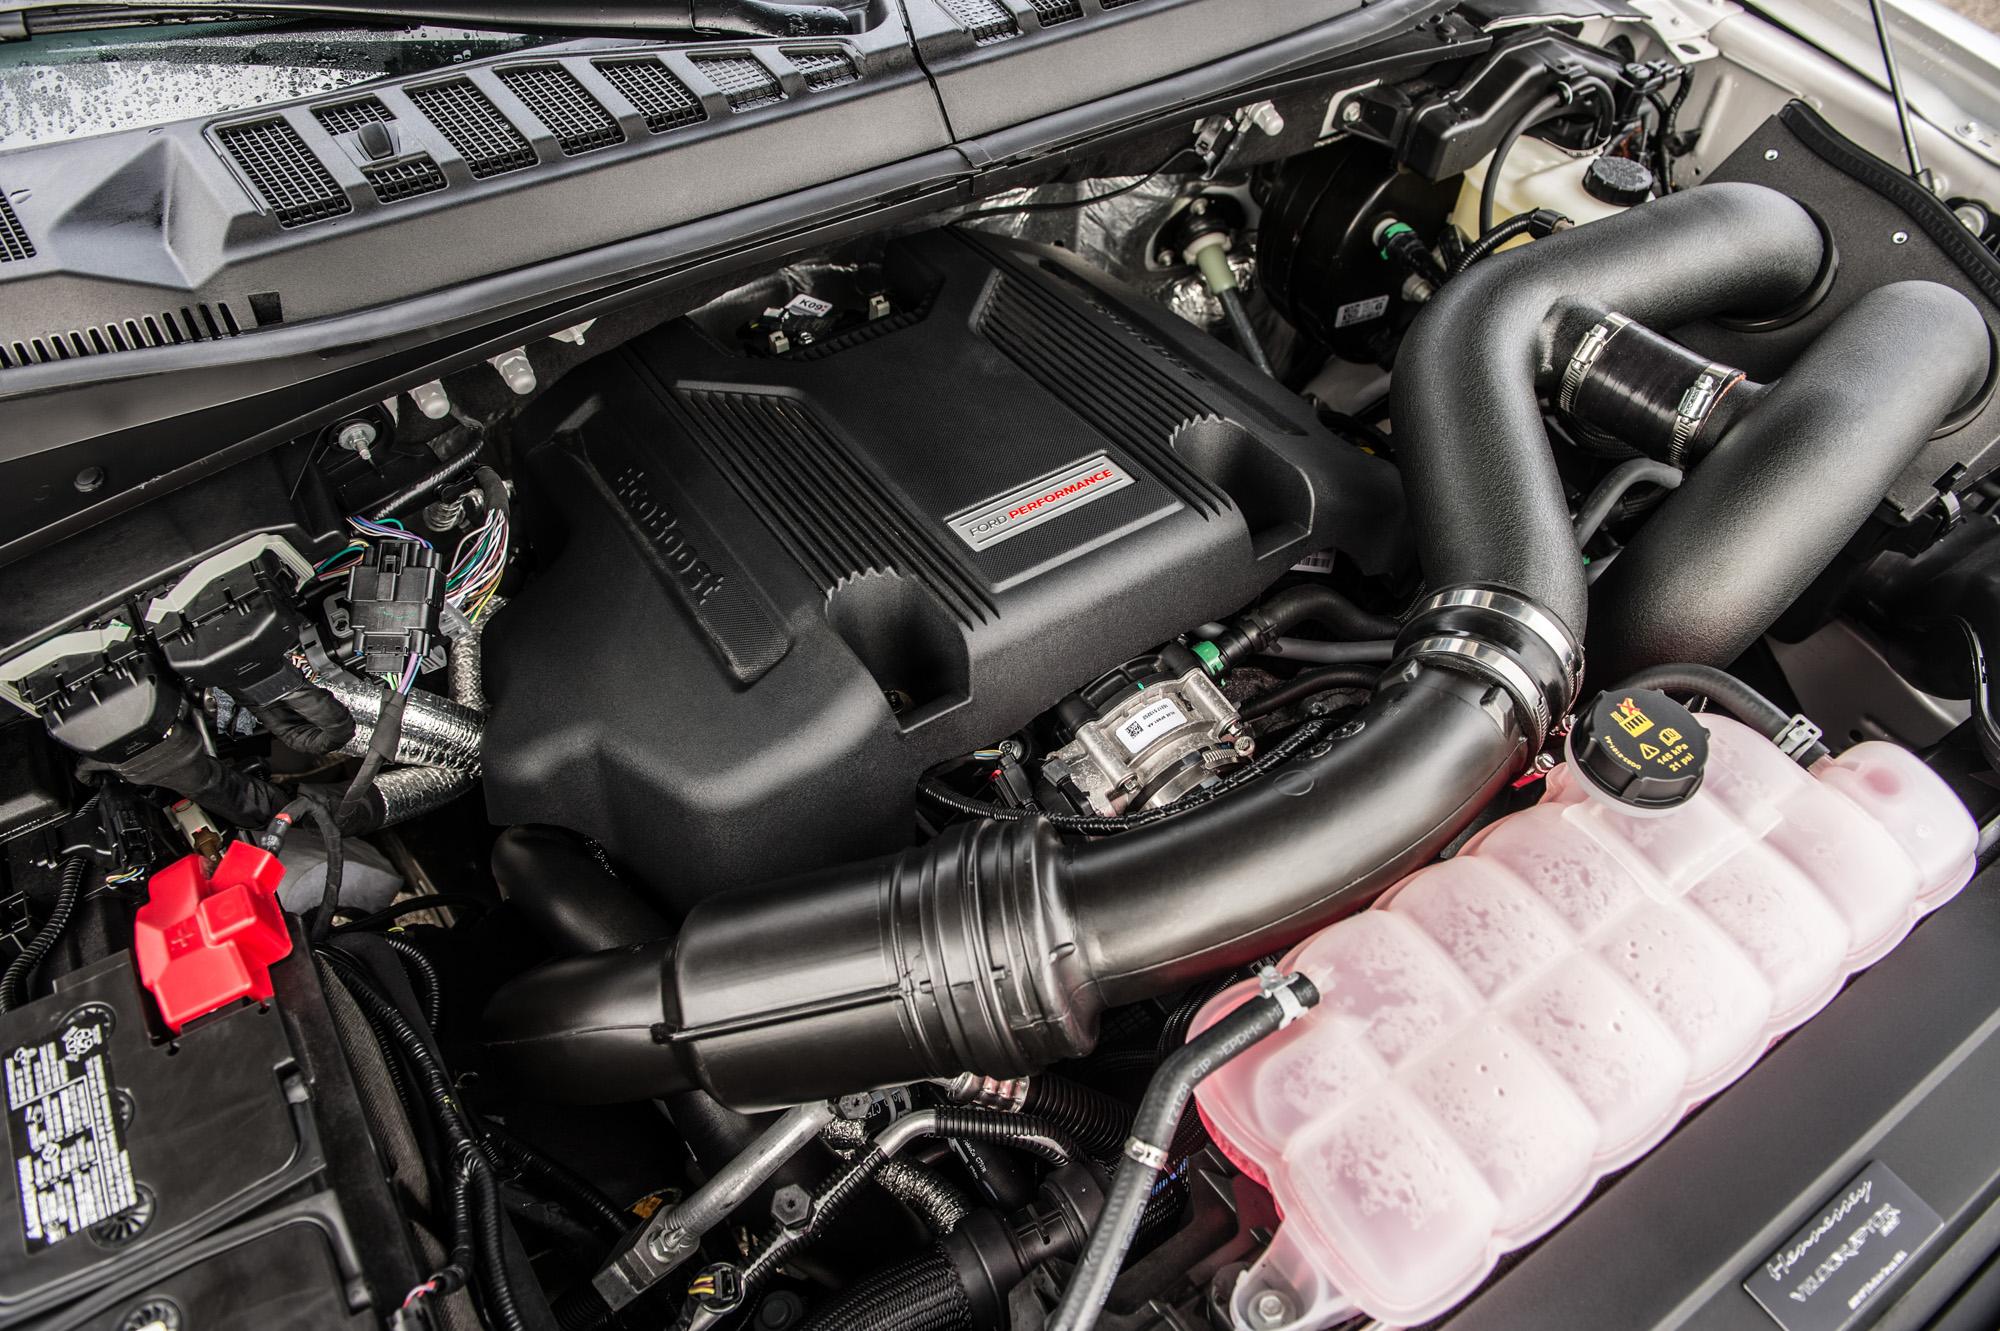 Motor V6 3.5 biturbo alcança 613 cv e 85,9 mkgf